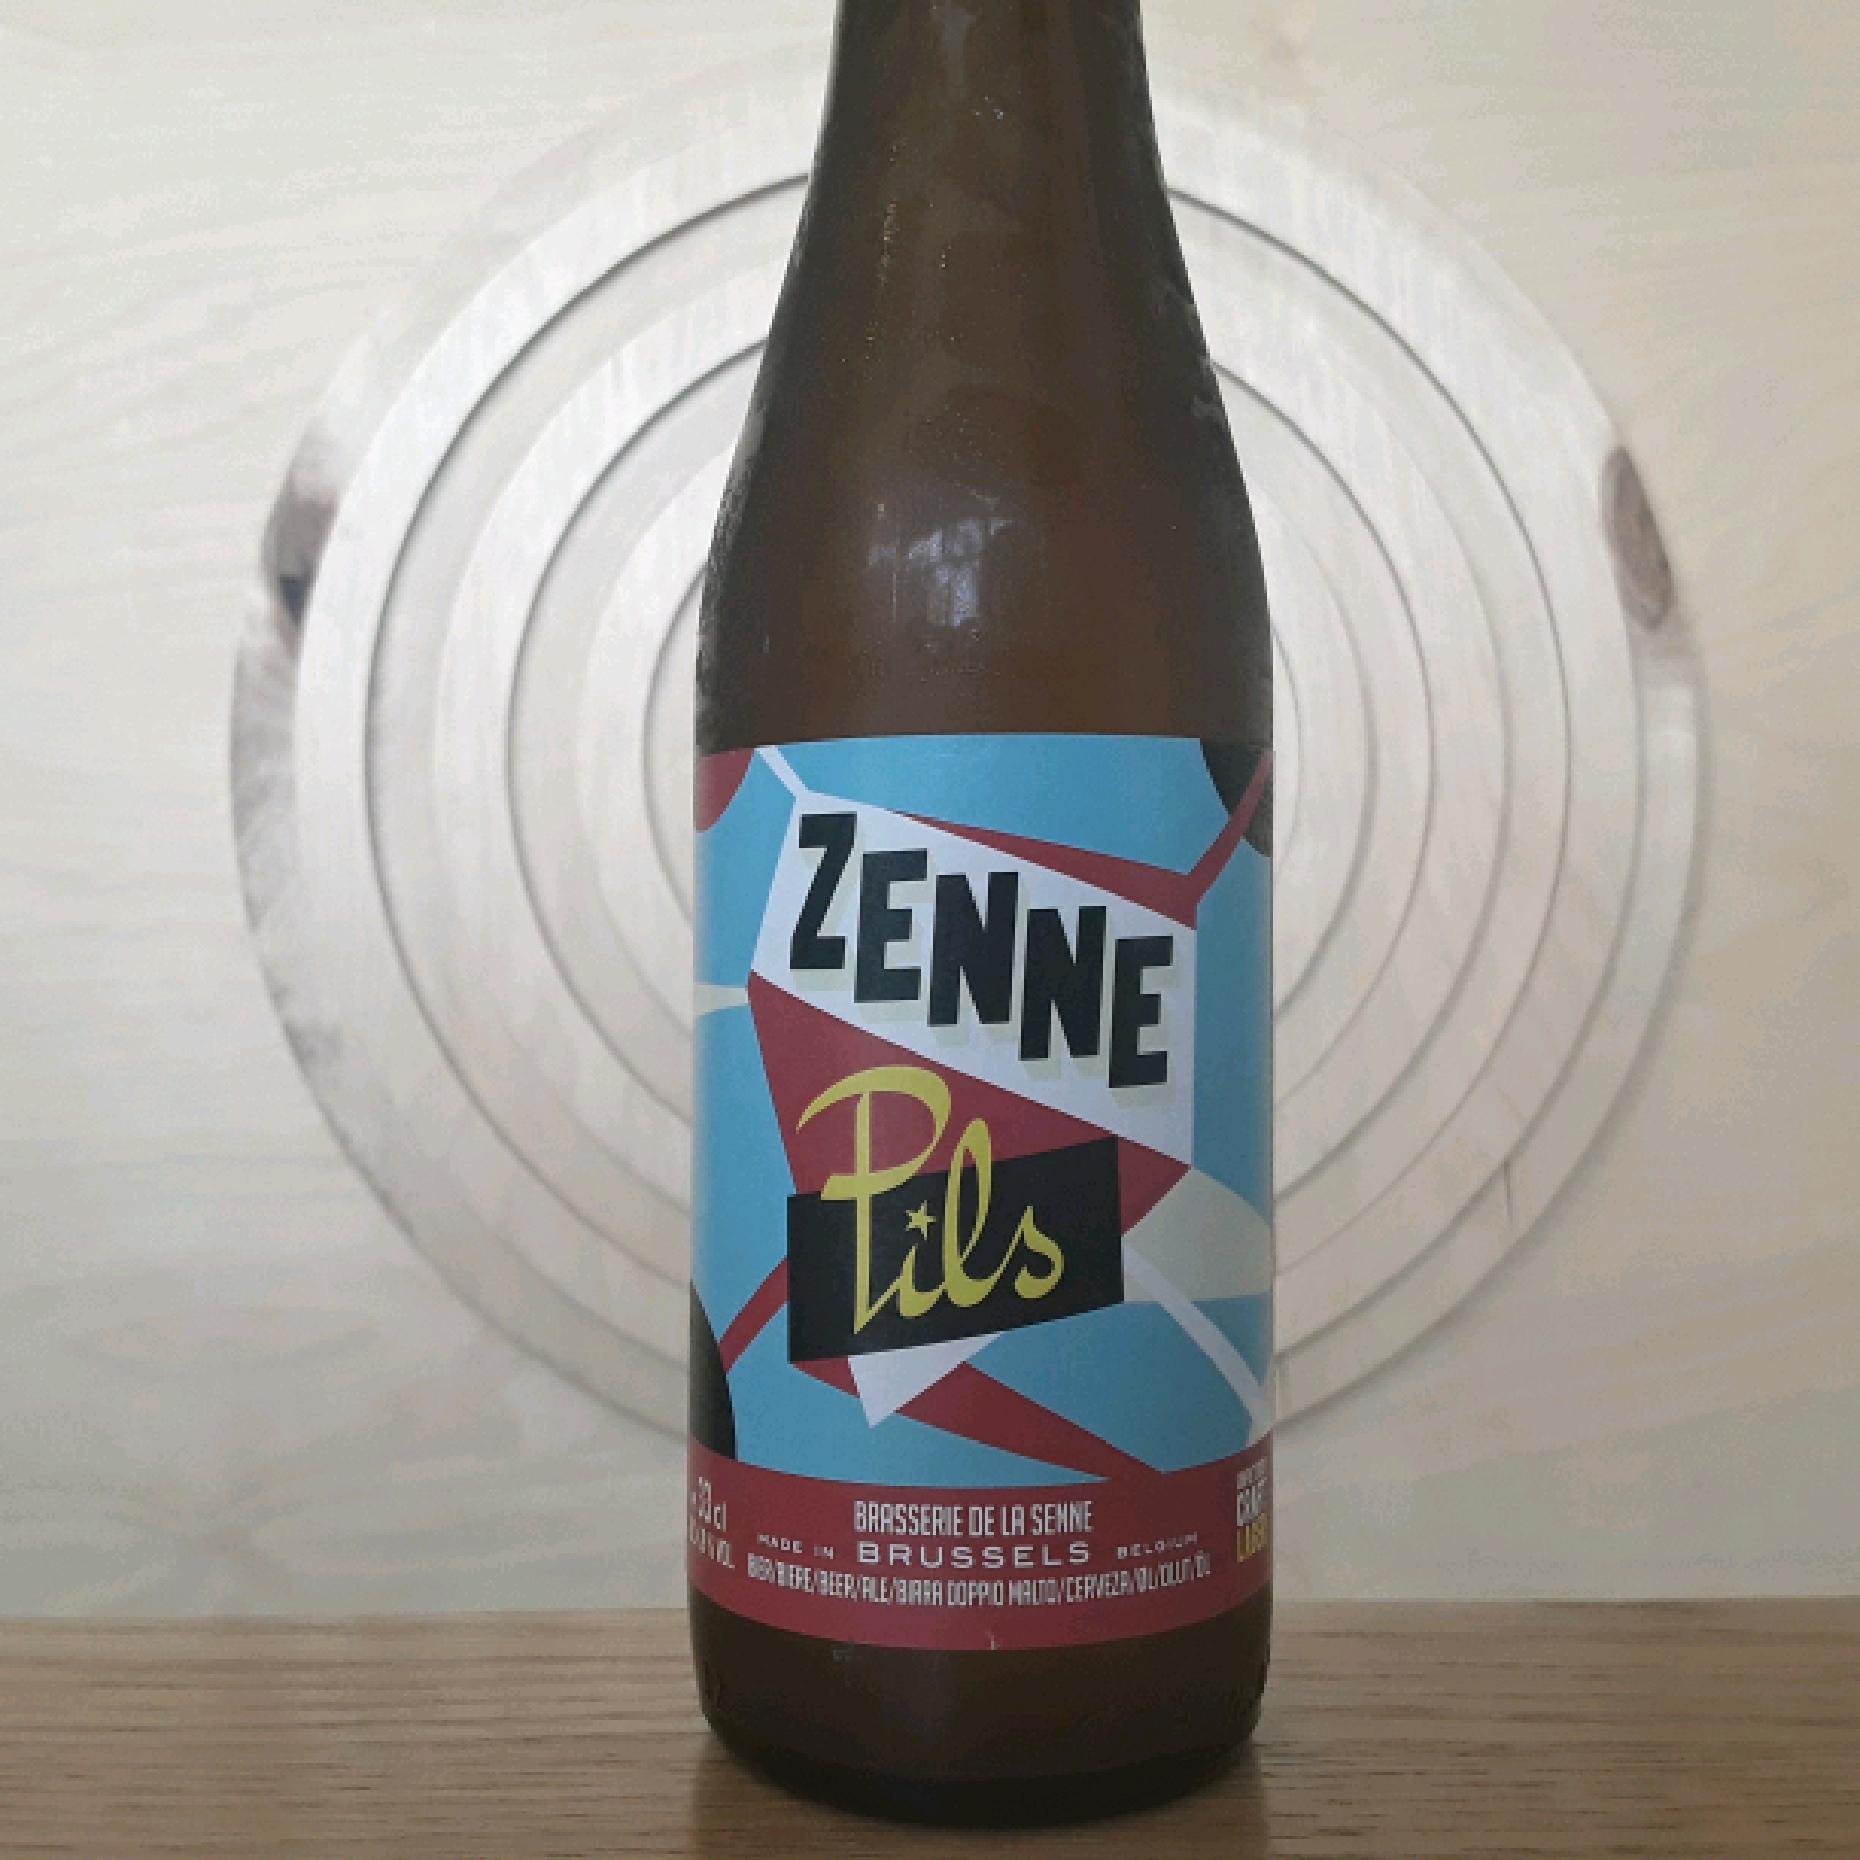 Brasserie de la Senne | Zenne Pils | Pilsner